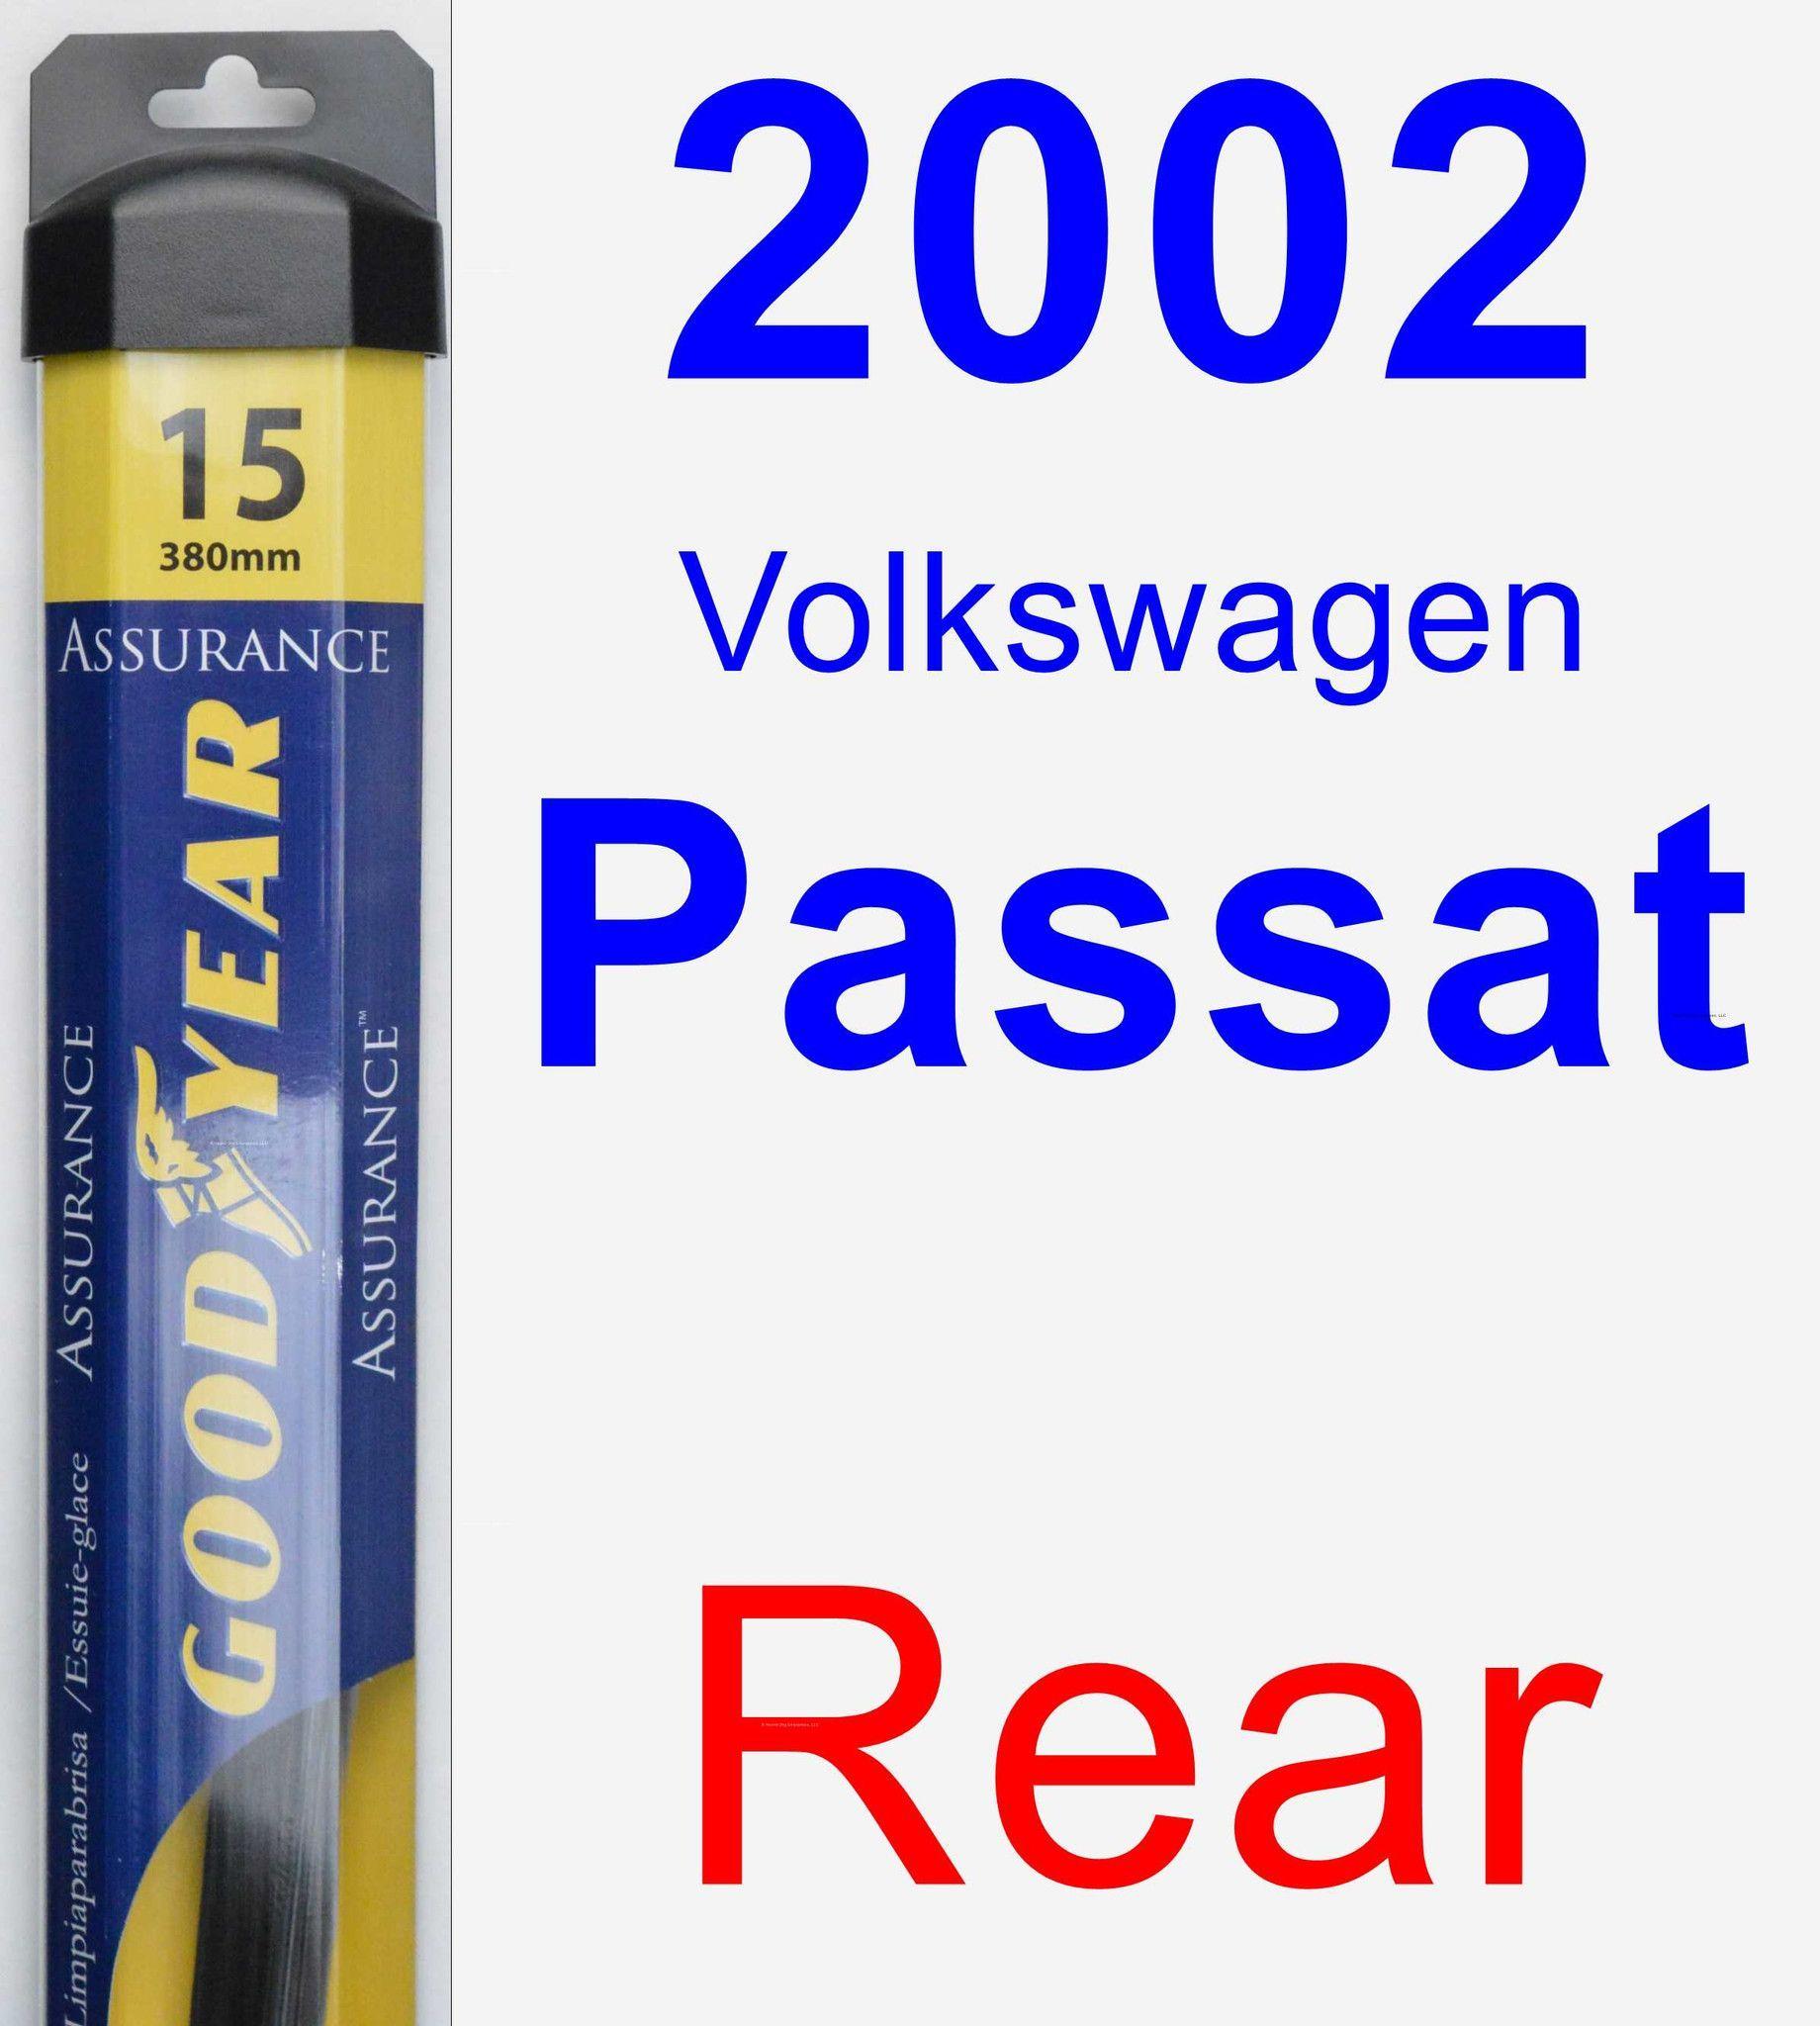 rear wiper blade for 2002 volkswagen passat assurance